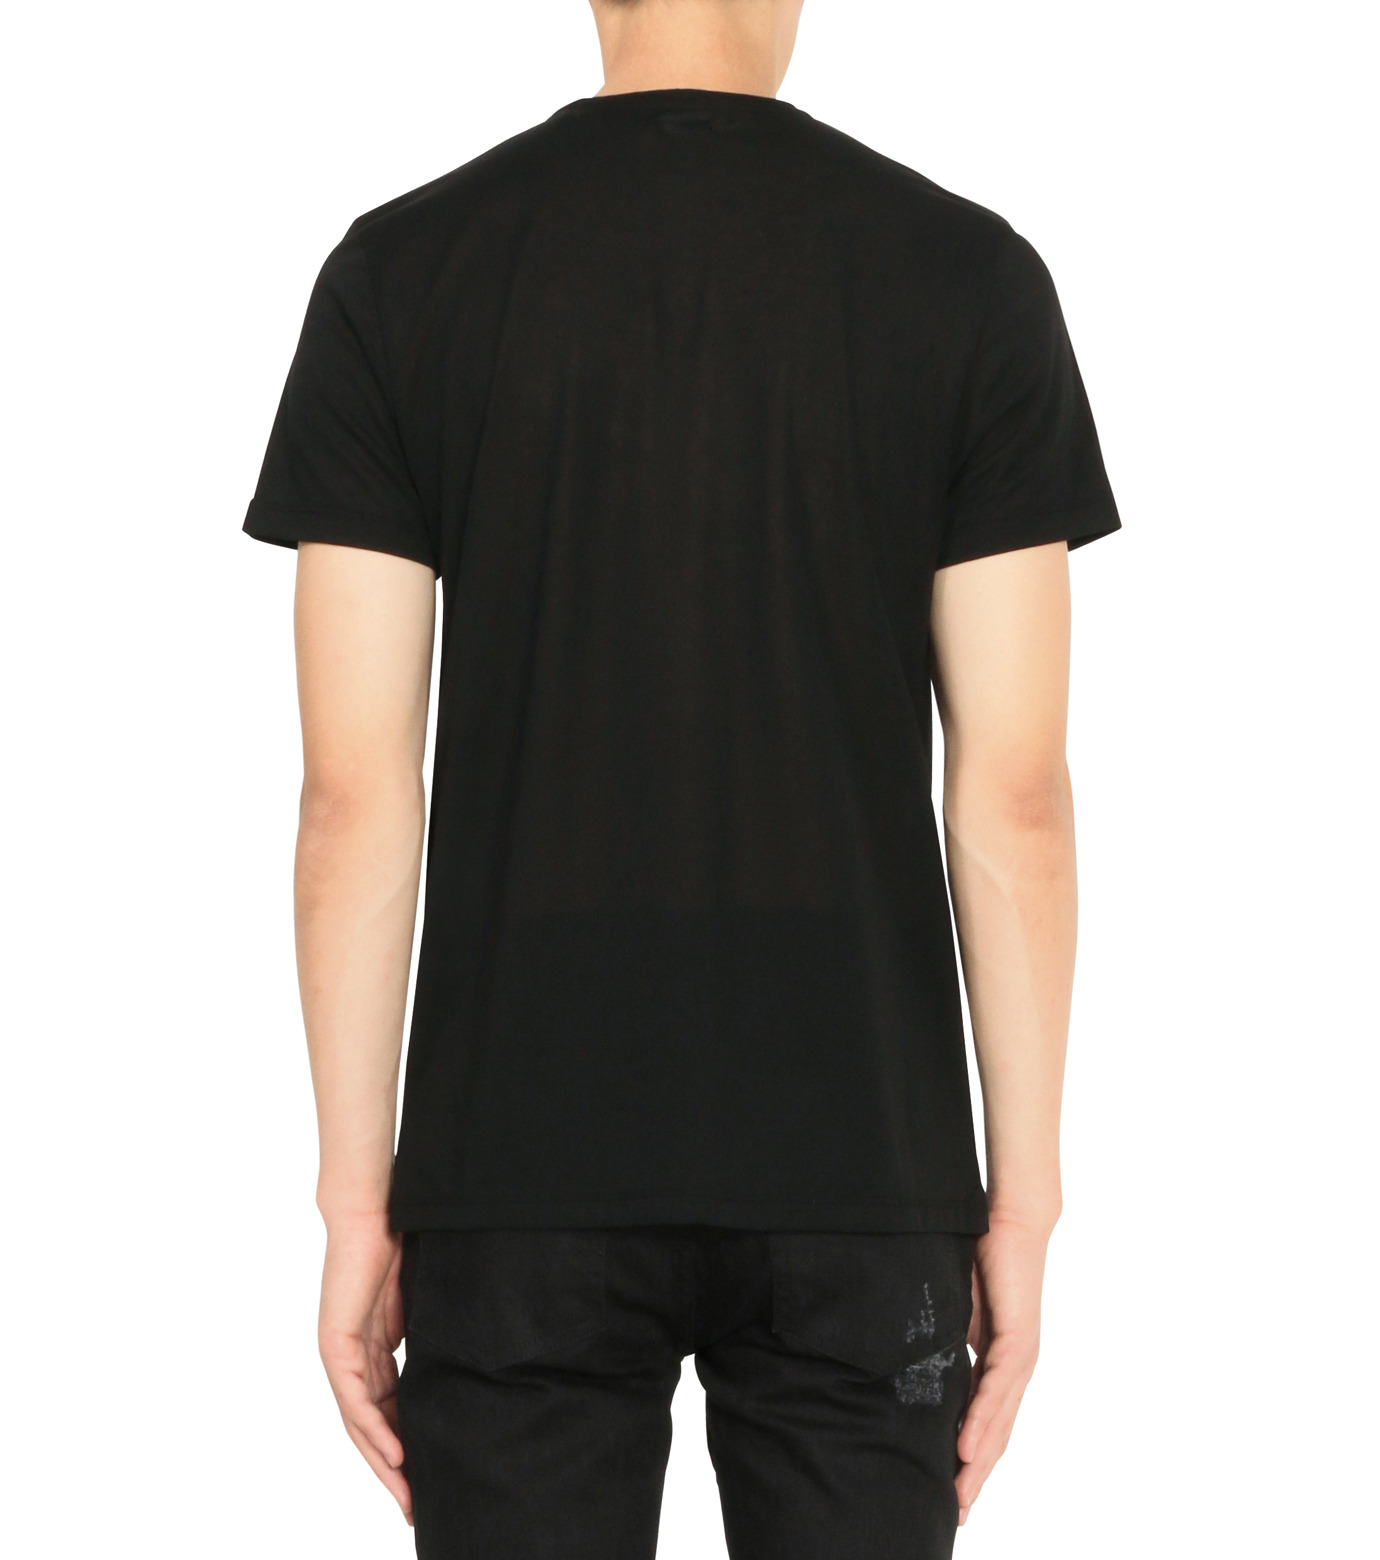 Alexander McQueen(アレキサンダーマックイーン)のPrint T-BLACK(カットソー/cut and sewn)-435907QHZT8-13 拡大詳細画像2